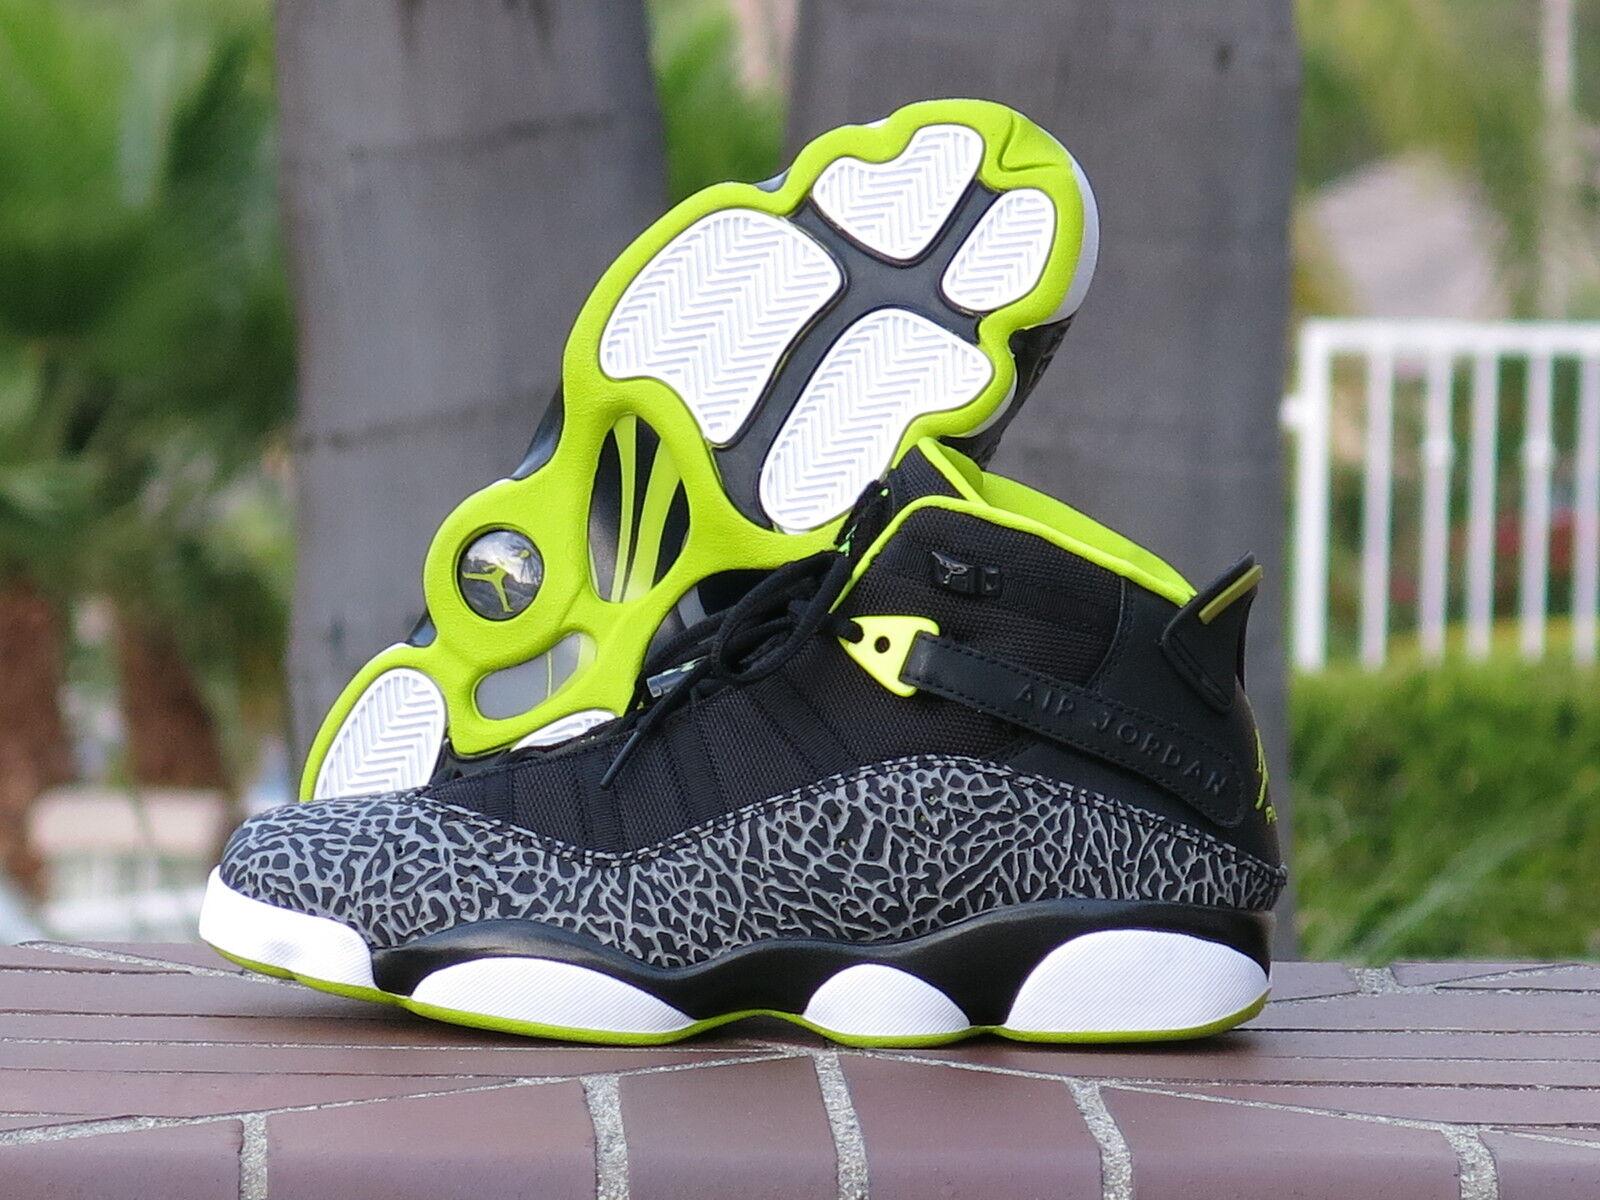 2013 Nike Air Jordan 6 Ring Men's Basketball shoes 322992-033 SZ 11